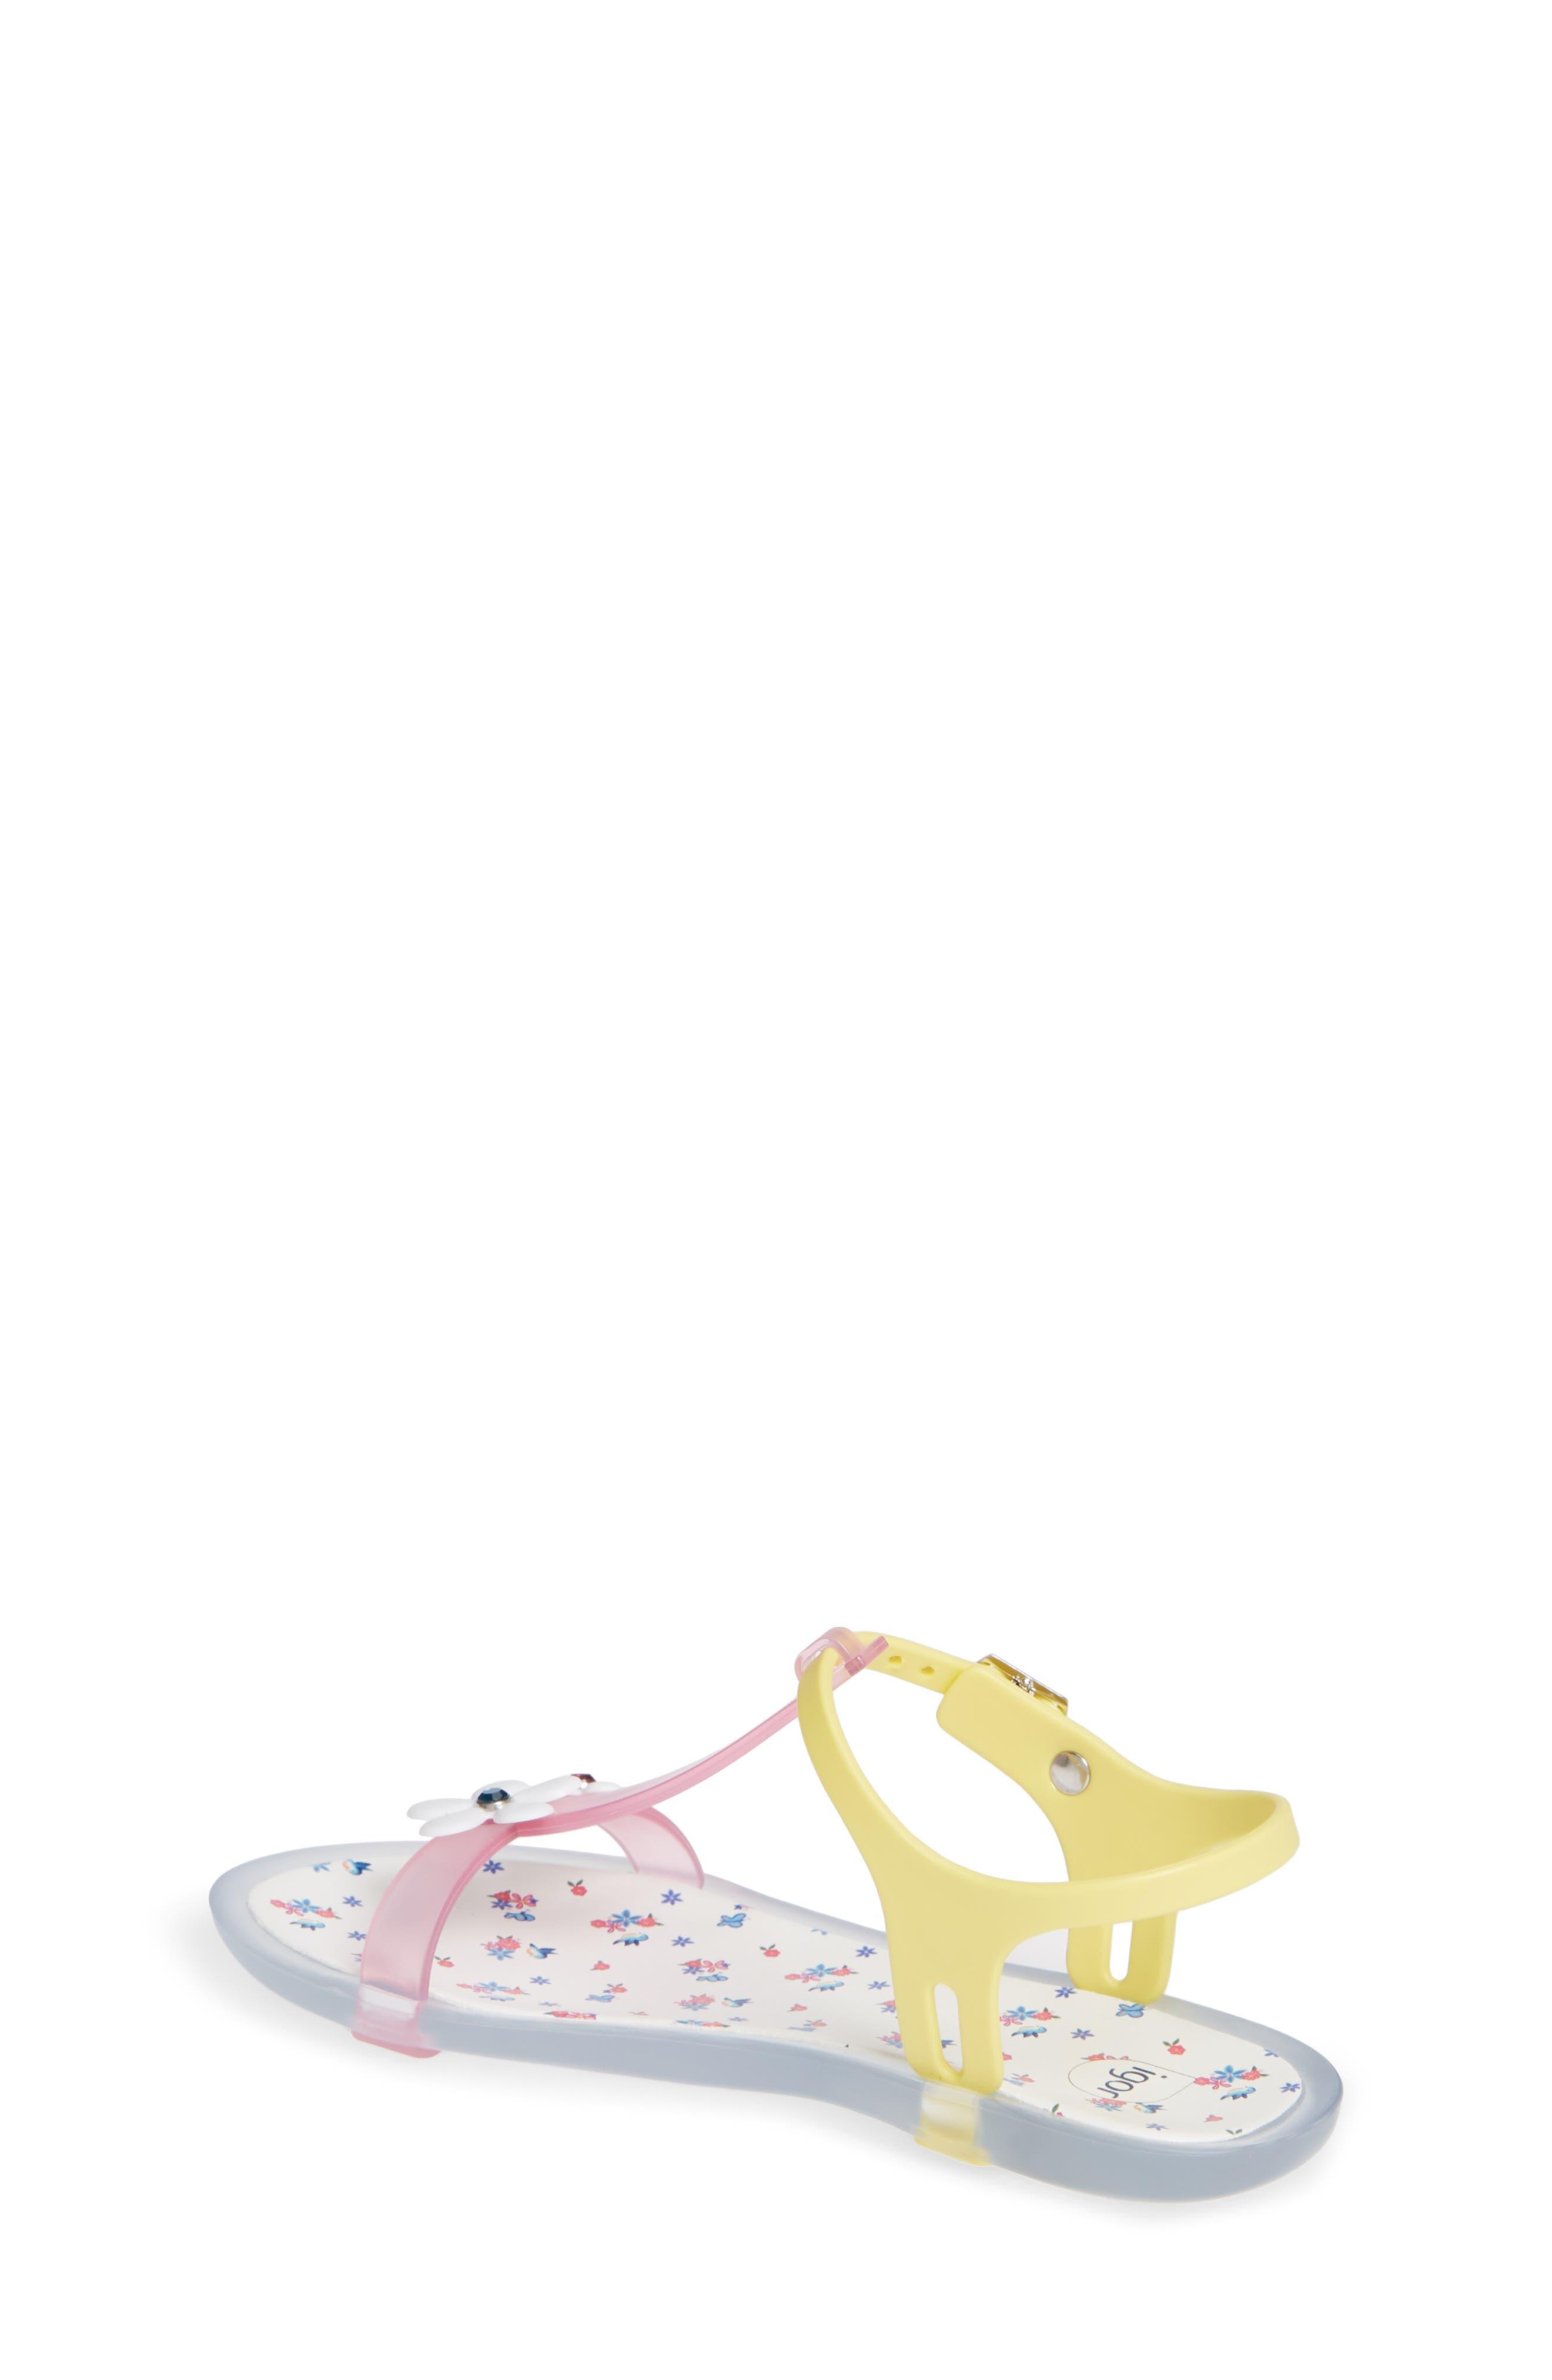 Tricia T-Strap Sandal,                             Alternate thumbnail 3, color,